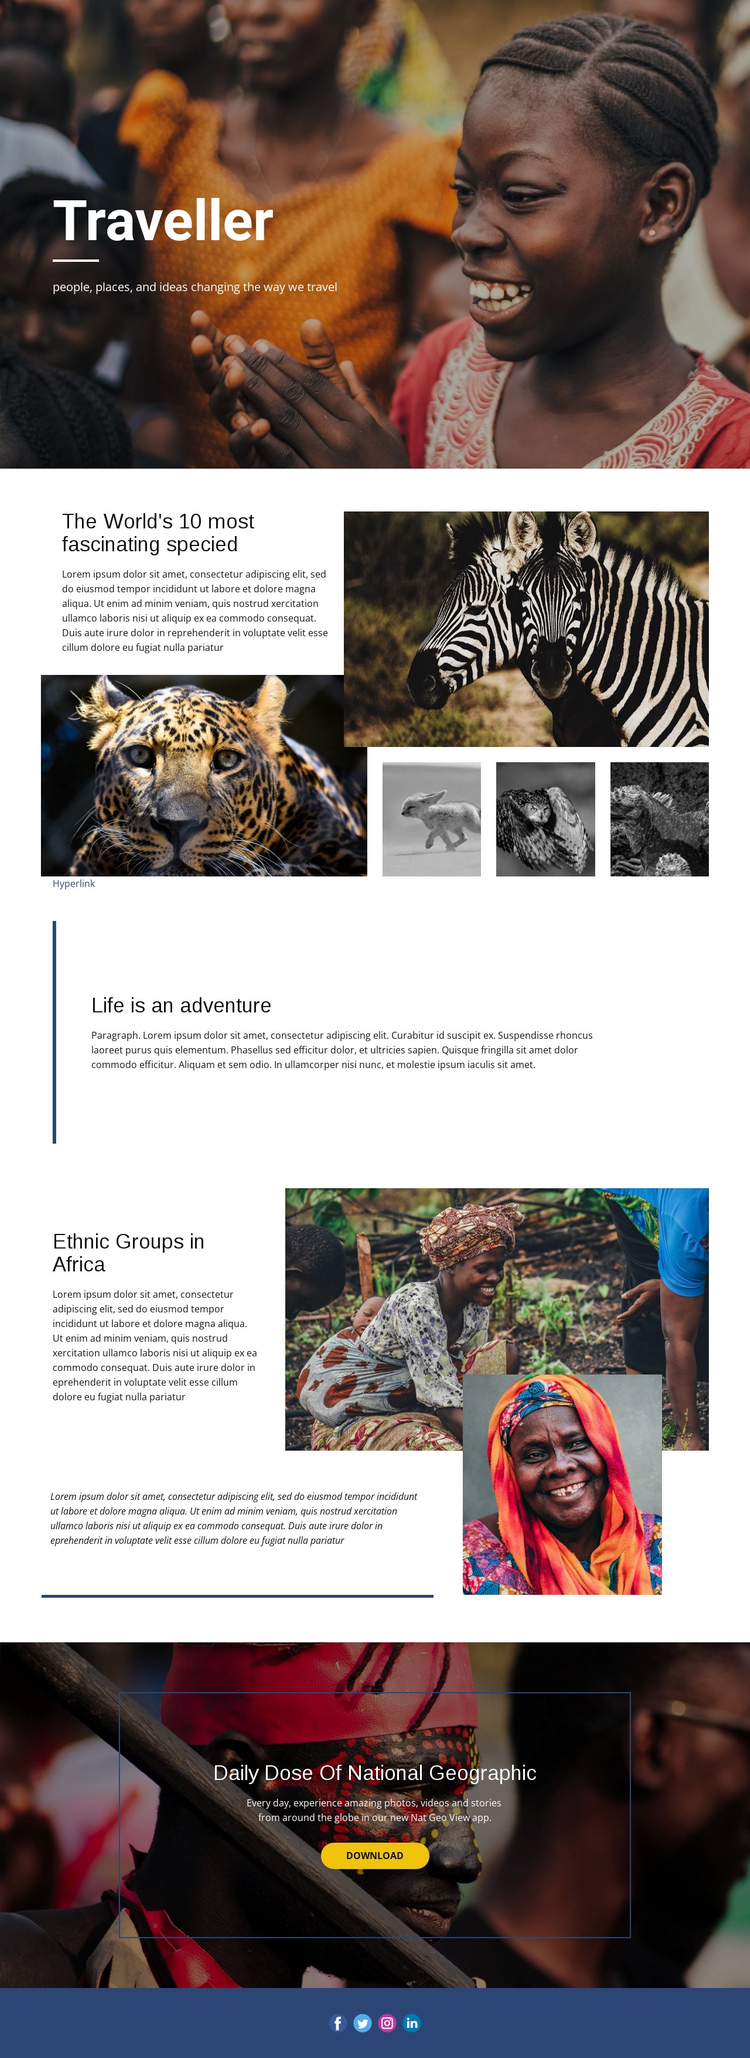 Life is an adventure Website Builder Software